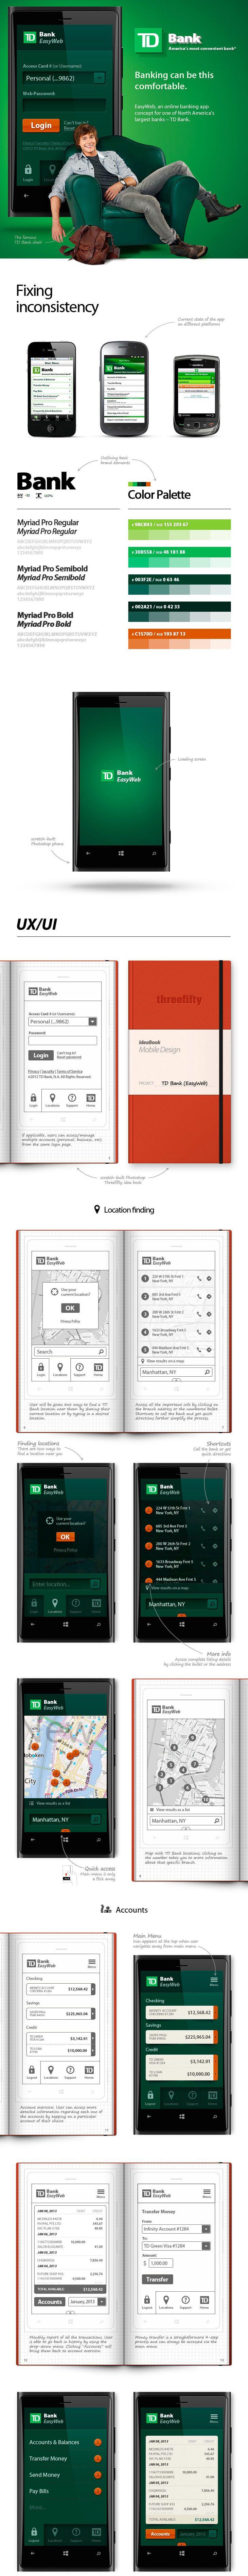 TD Bank Easy Web App UX/UI Design